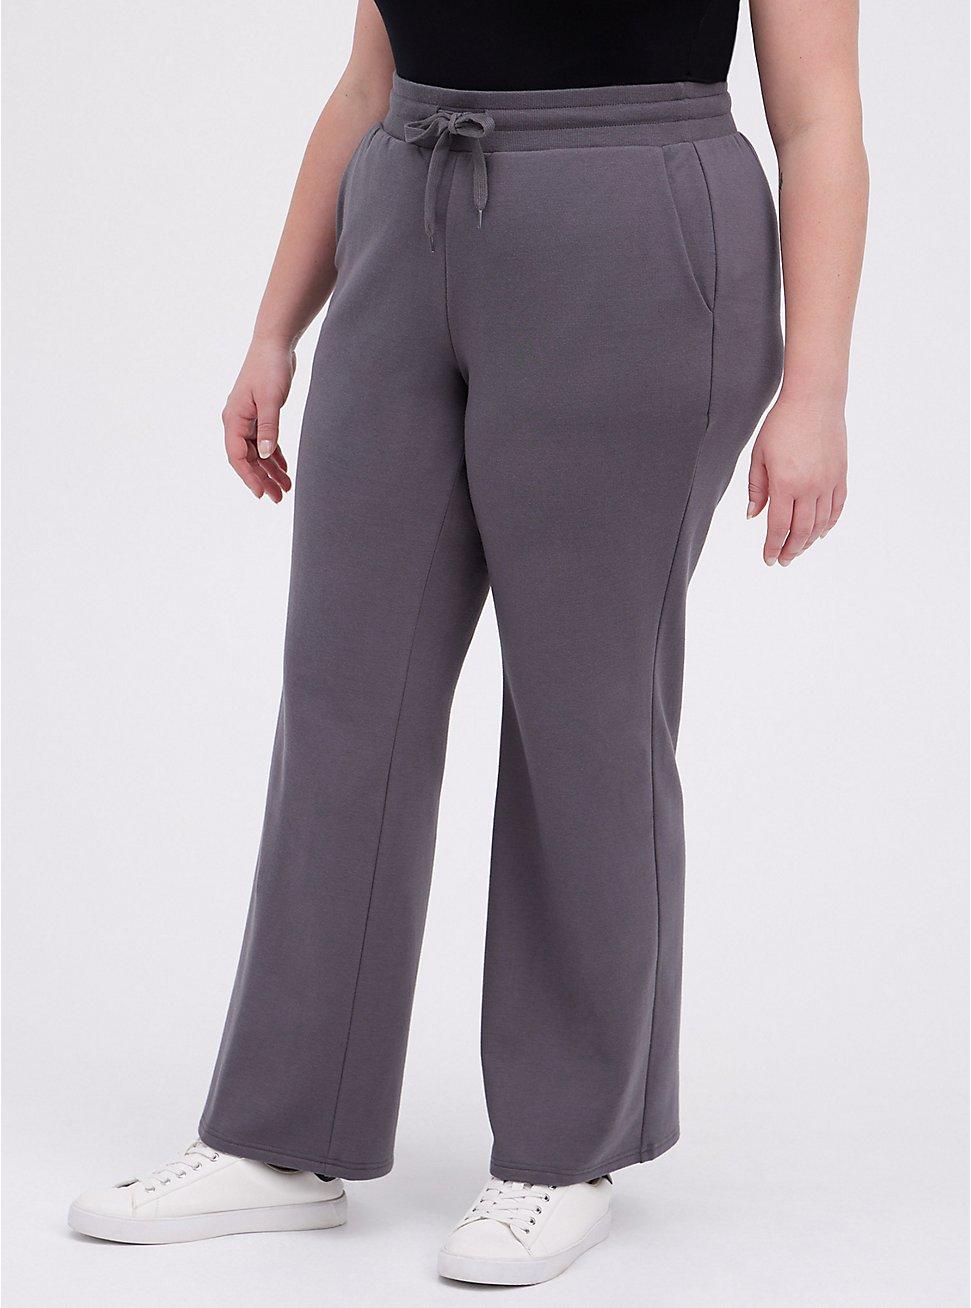 Plus Size Flare Pant - Ultra Soft Fleece Dark Grey, DARK GREY, hi-res